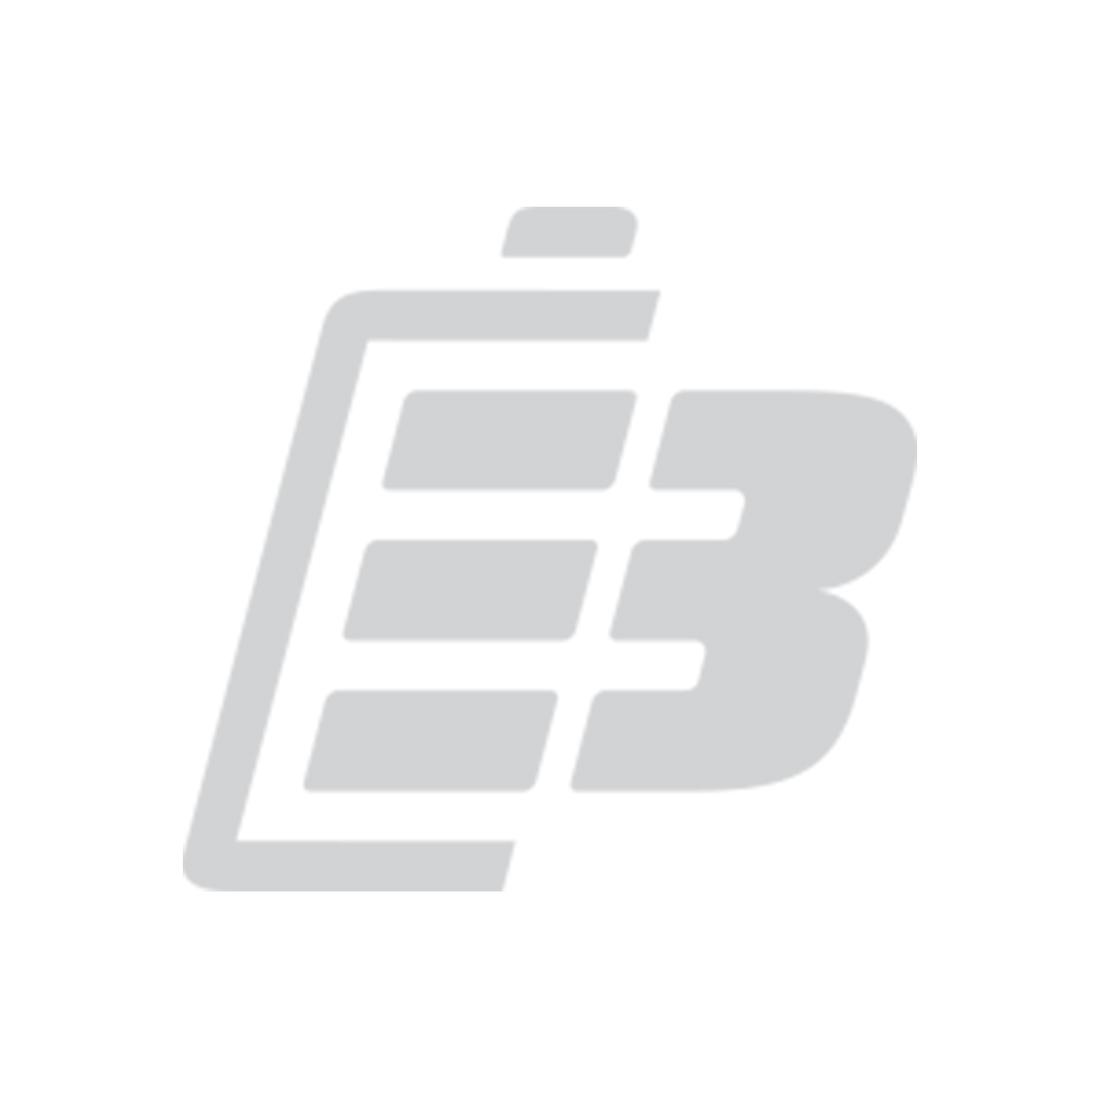 CSB Lead Acid Battery GP1272 1